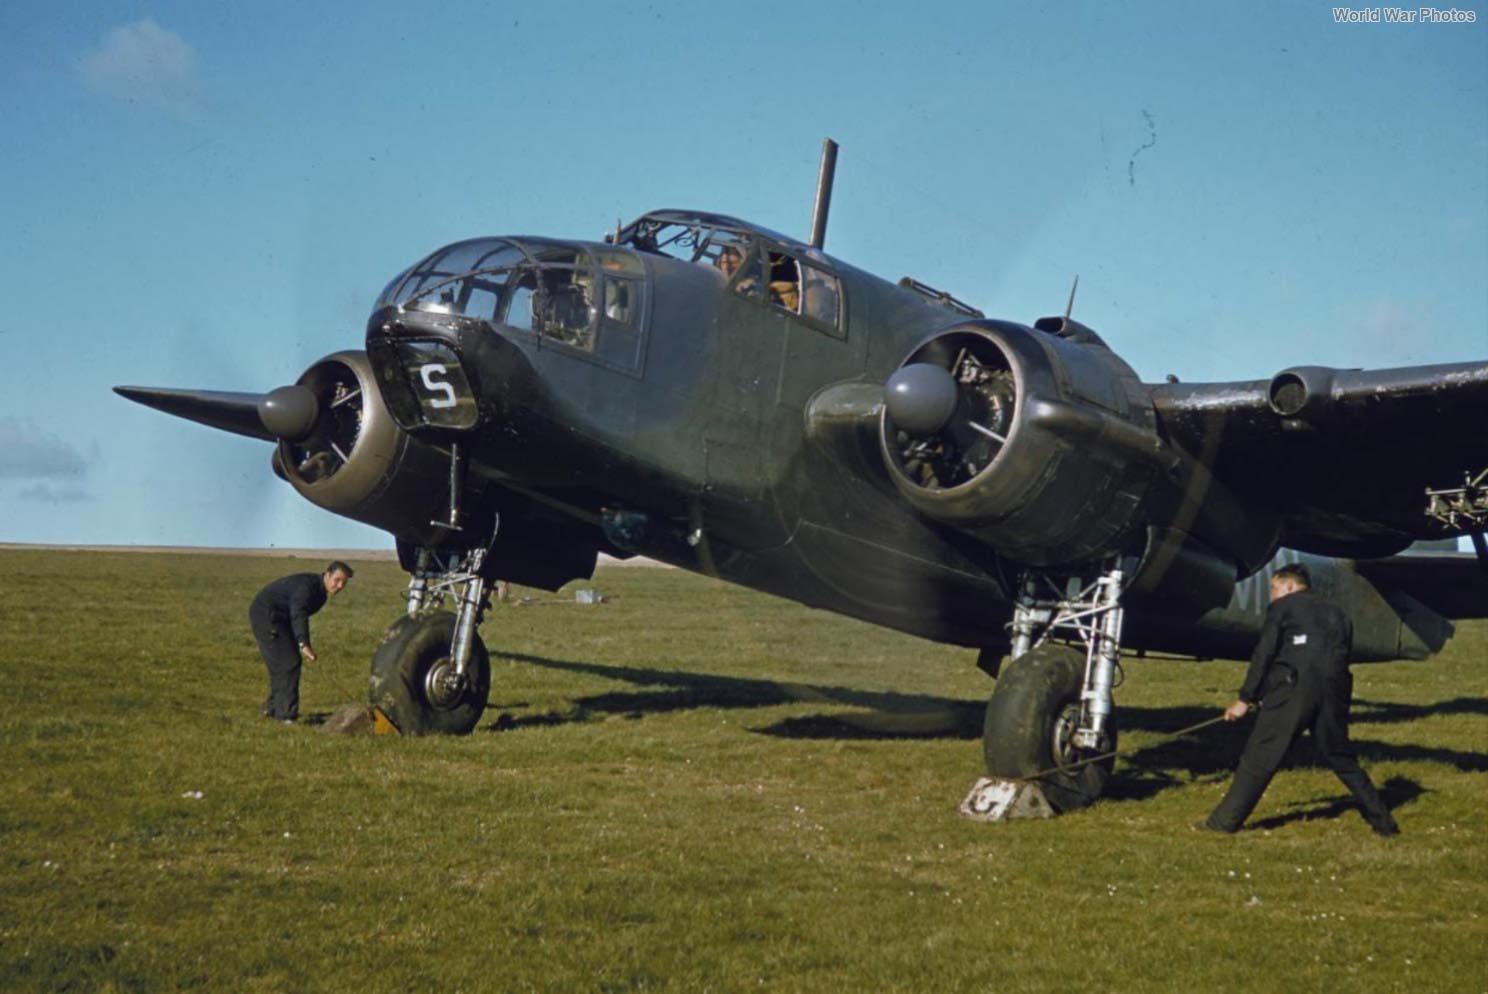 Beaufort Mk I MW-S of No. 217 Squadron RAF 2